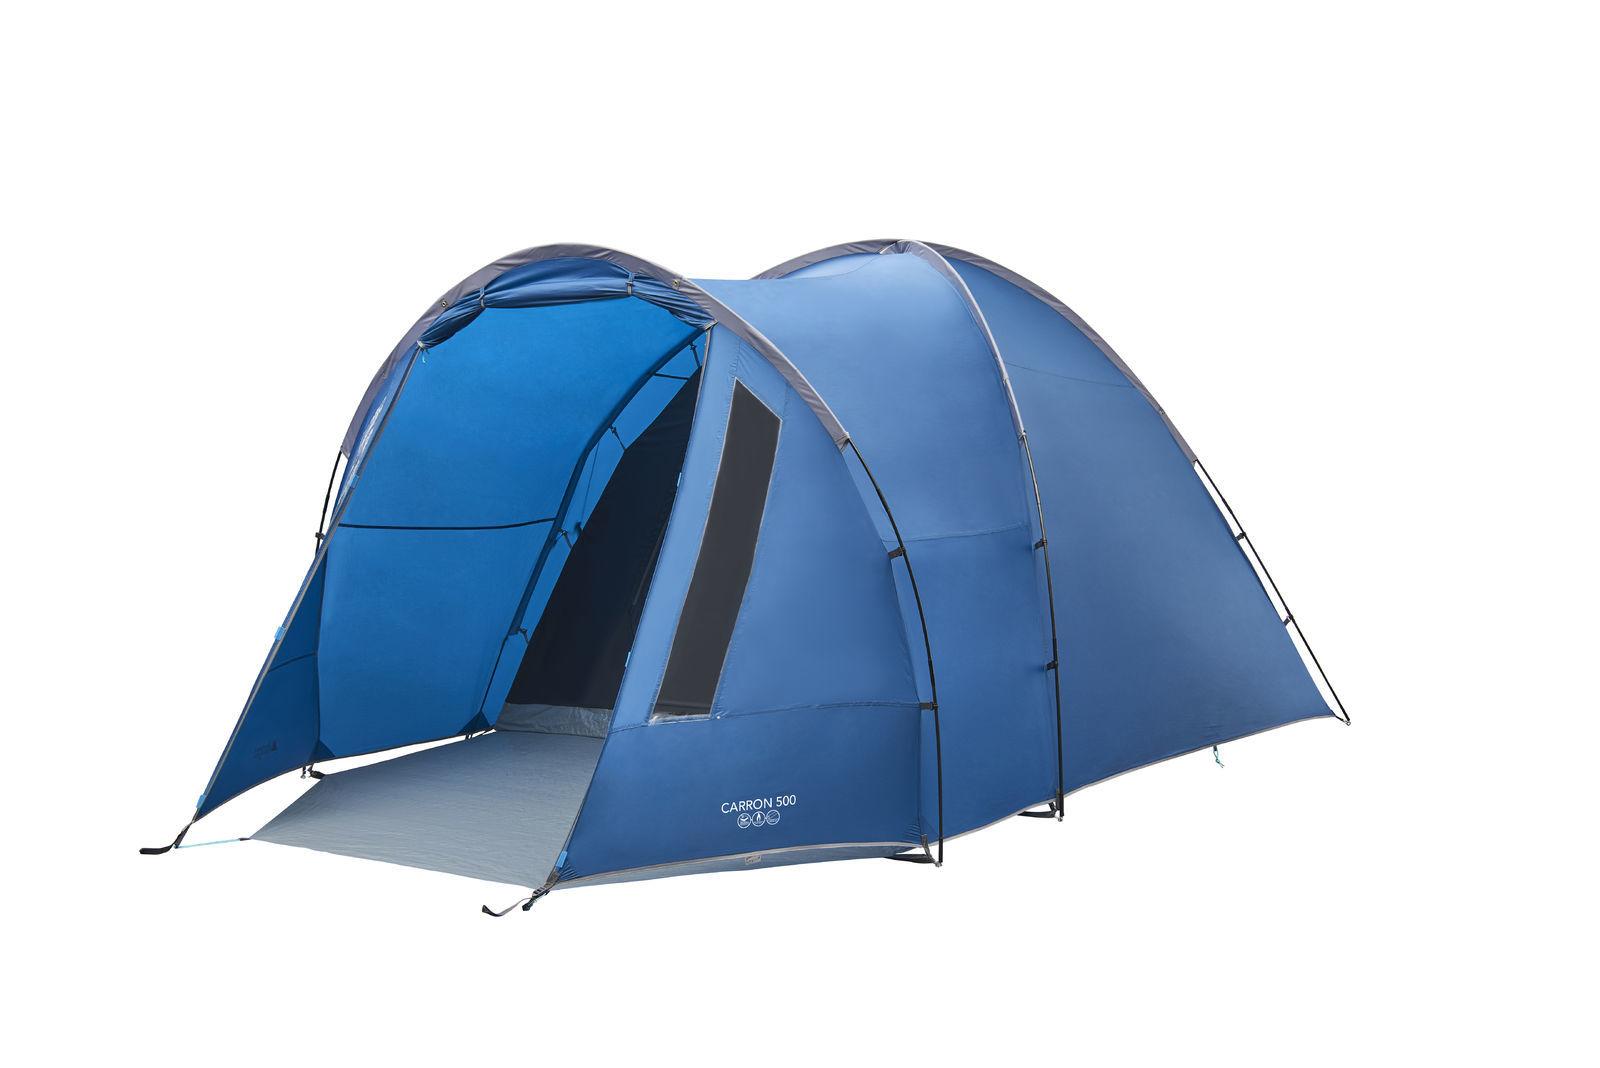 Vango Carron 500 2021 Norwich Camping 6